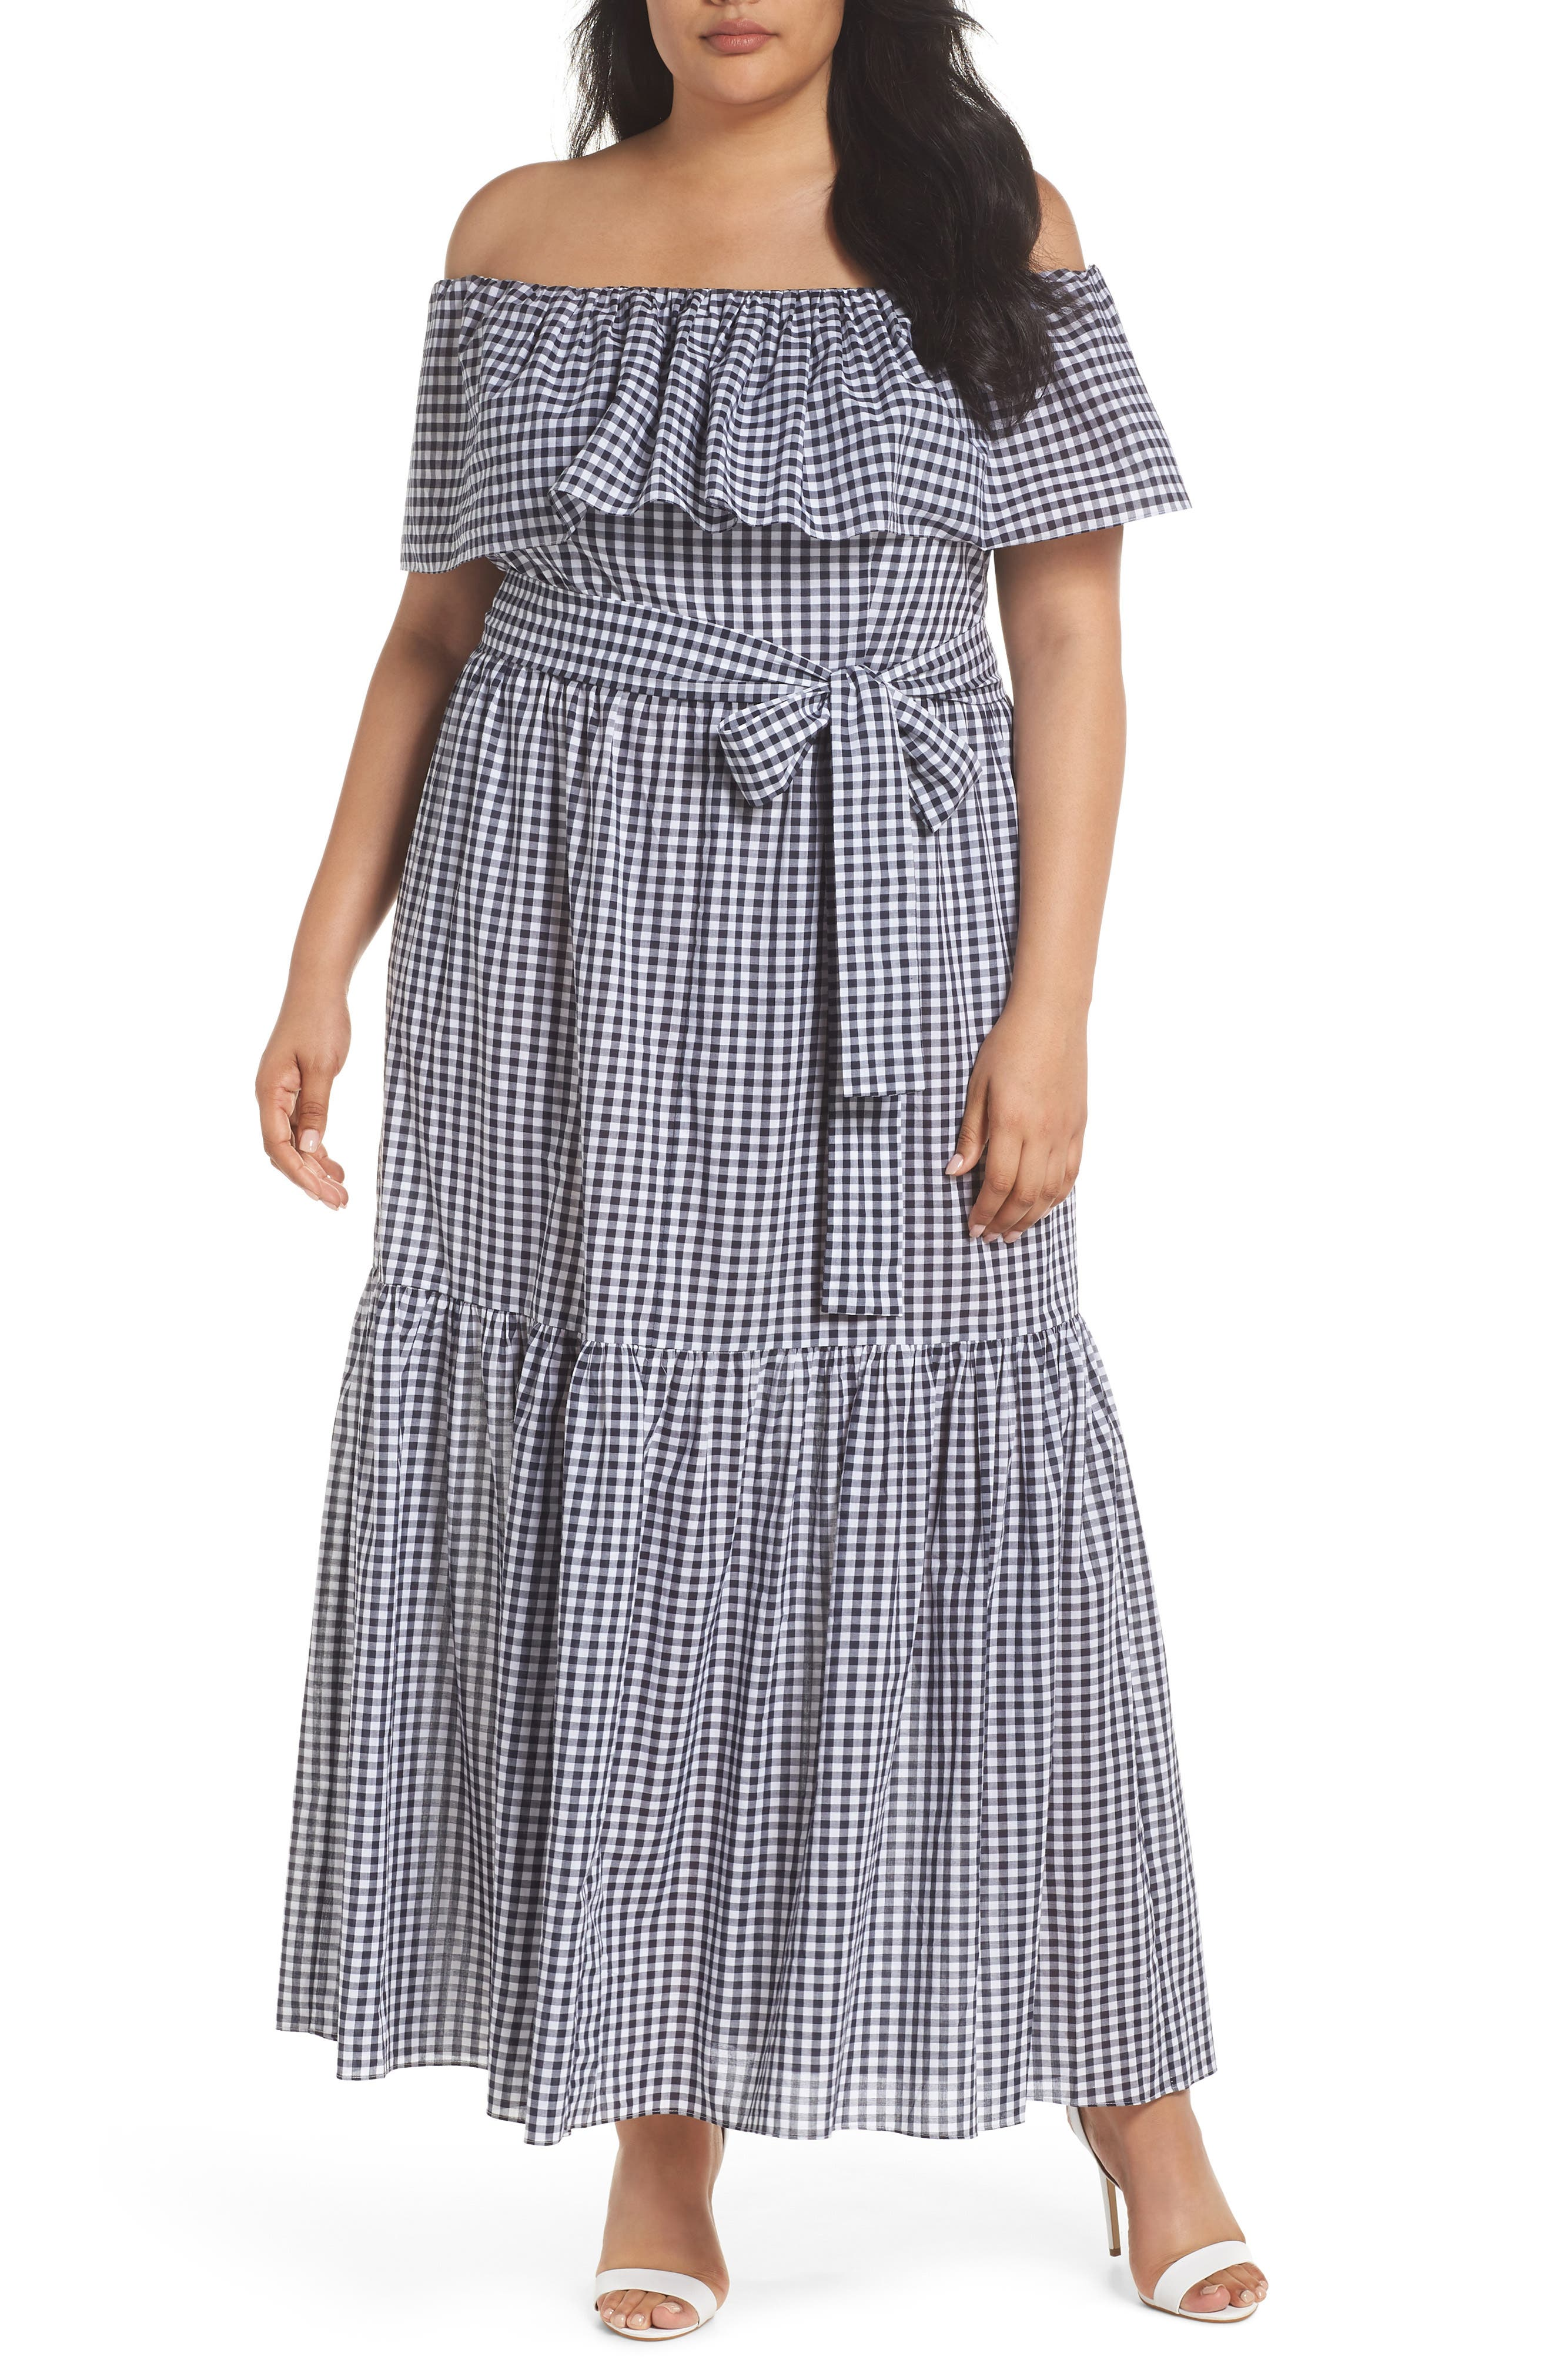 Off the Shoulder Gingham Maxi Dress,                         Main,                         color, Blue White Gingham